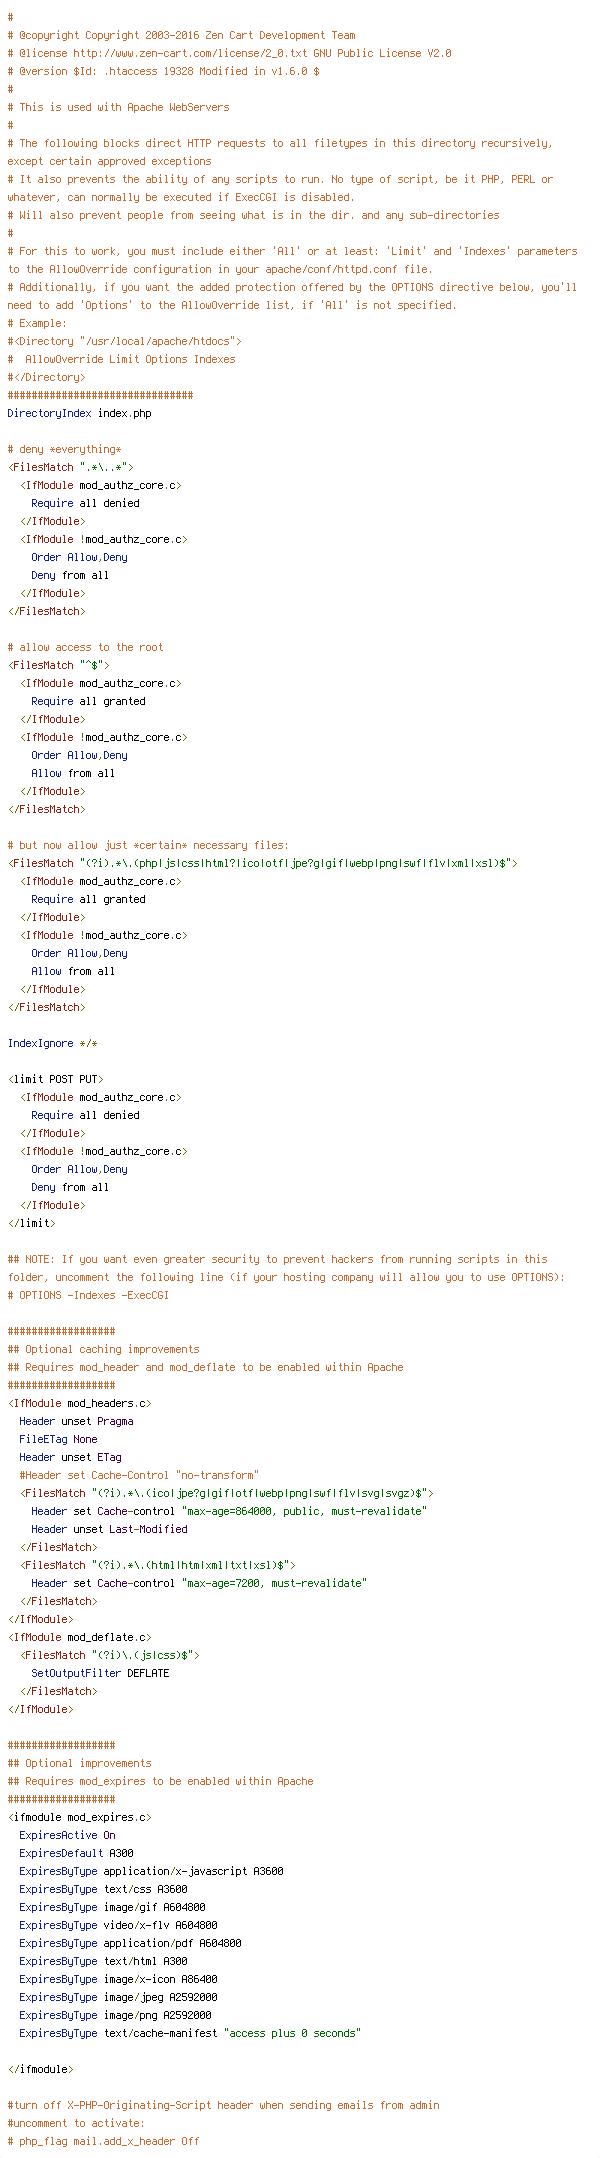 ajeh/zc-v1-series/v160/admin/ htaccess - Htaccess File